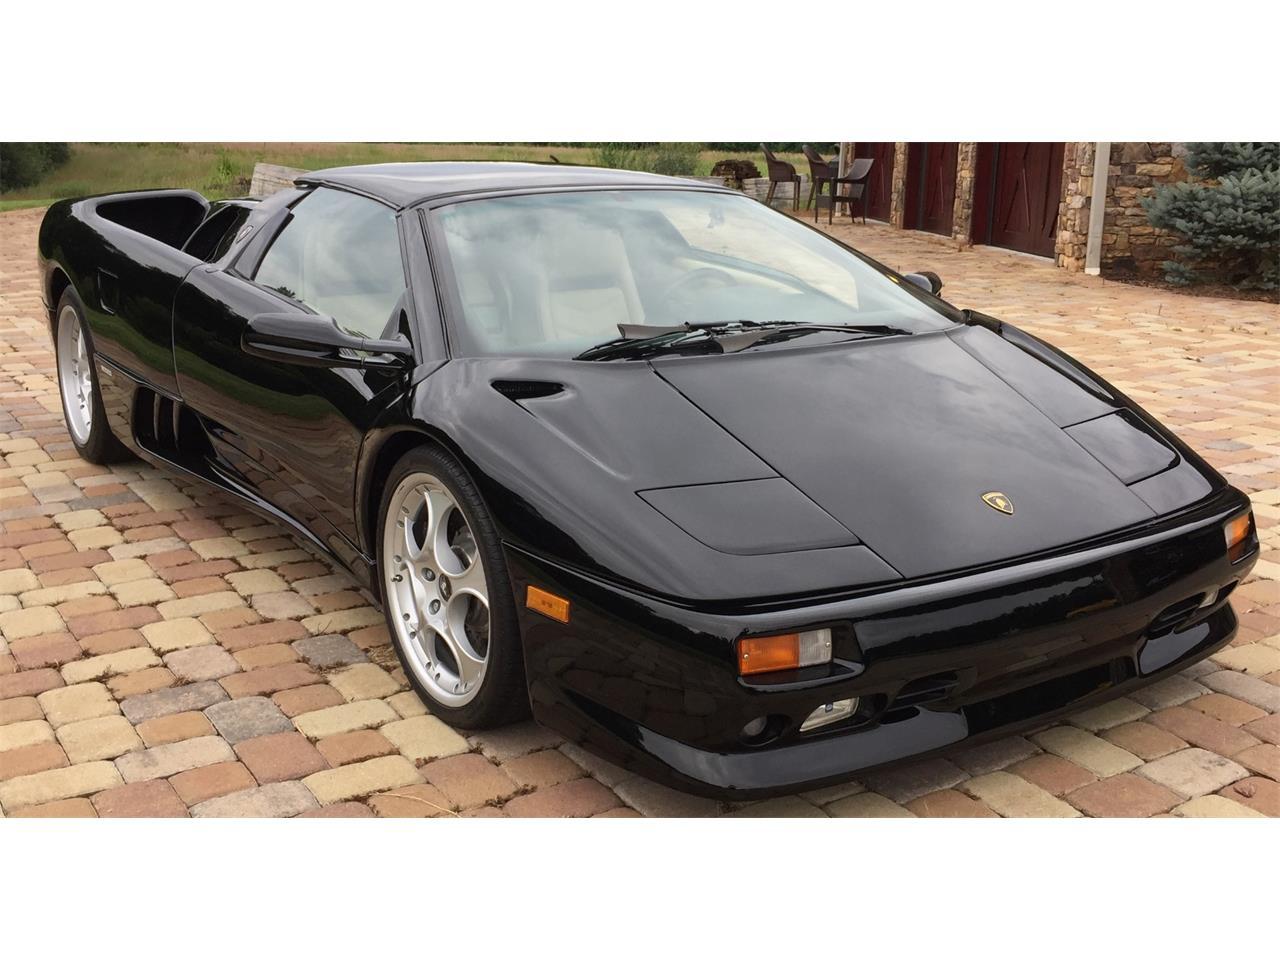 Large Picture of 1998 Lamborghini Diablo located in Alpharetta Georgia - $285,000.00 - L4GM